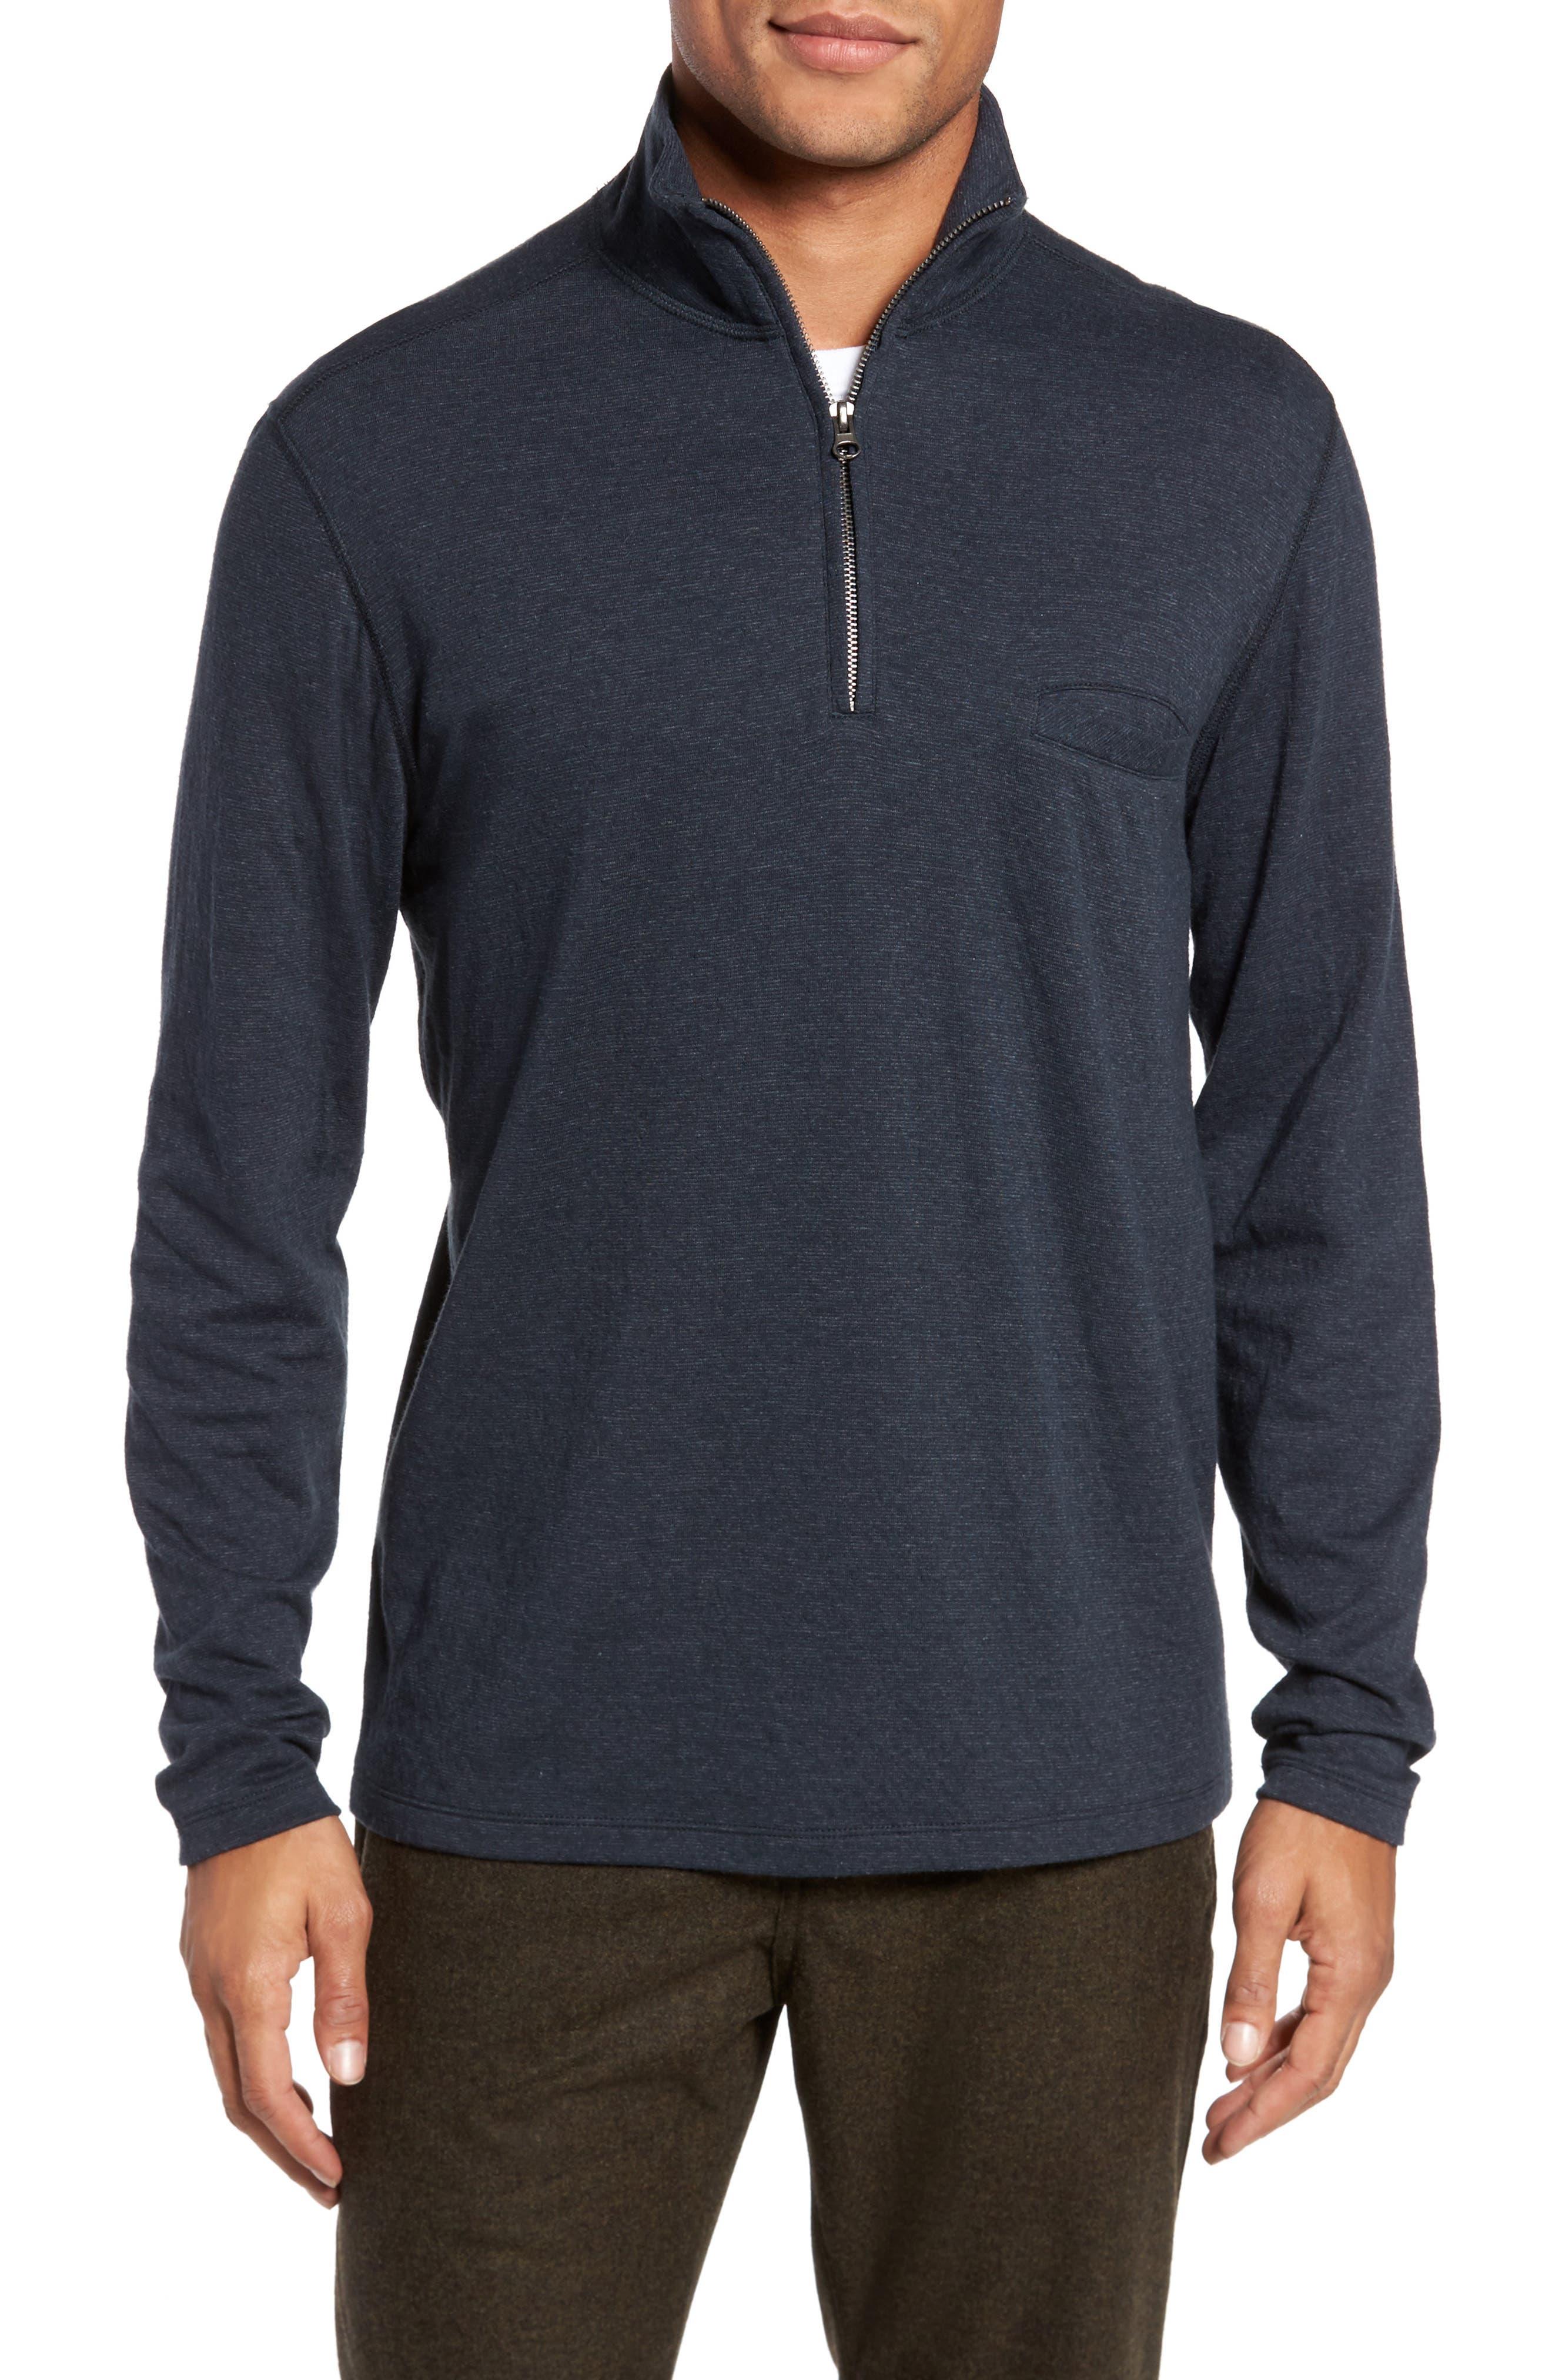 Jordan Quarter Zip Pullover,                         Main,                         color, Carbon Blue